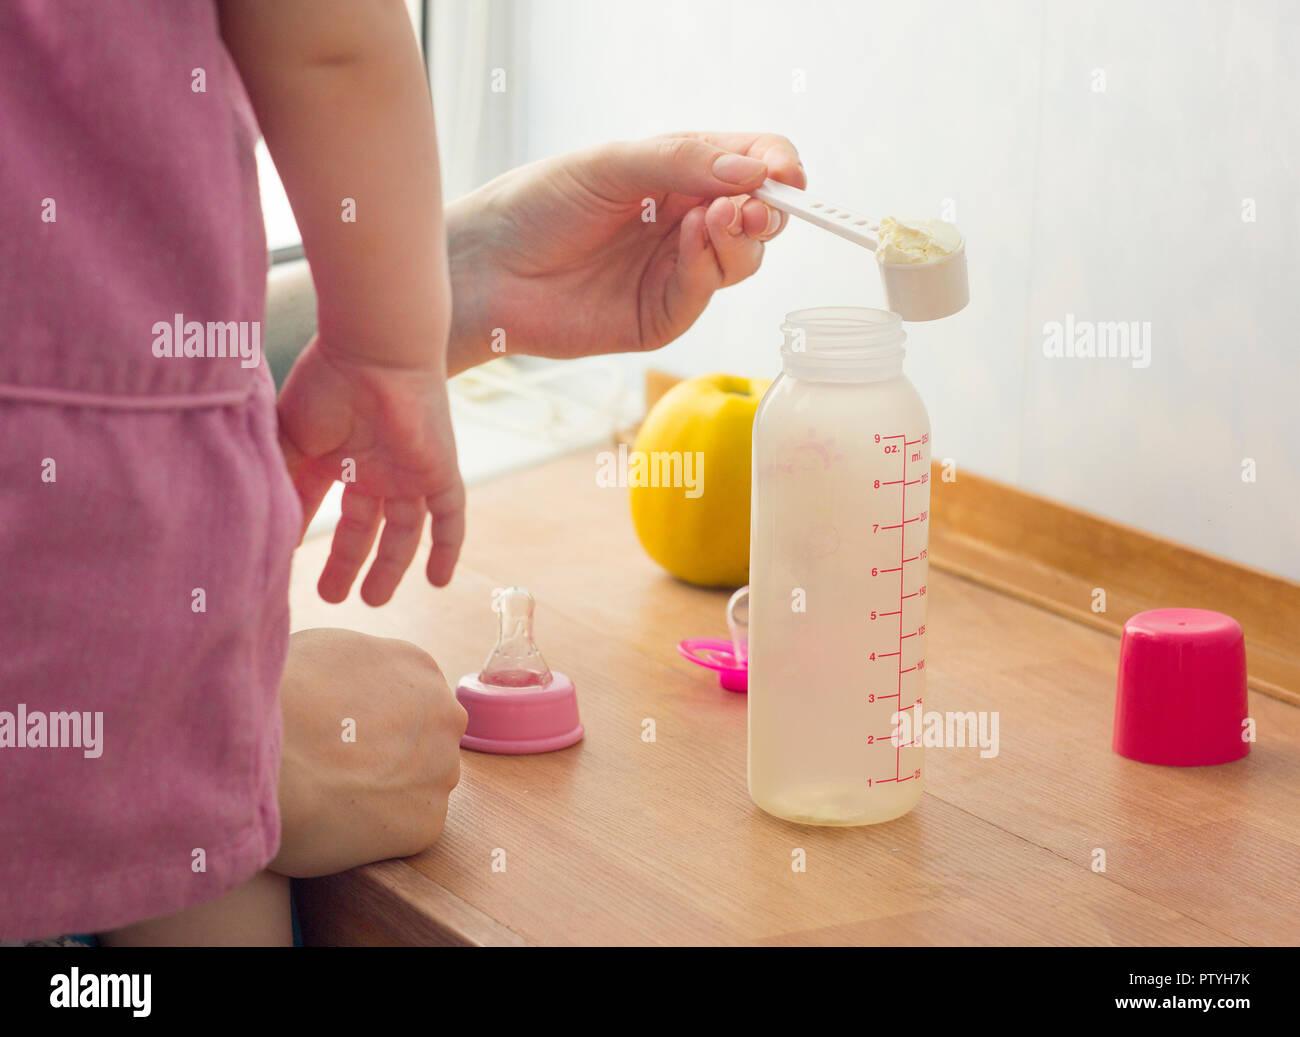 Preparation of infant formula - Stock Image